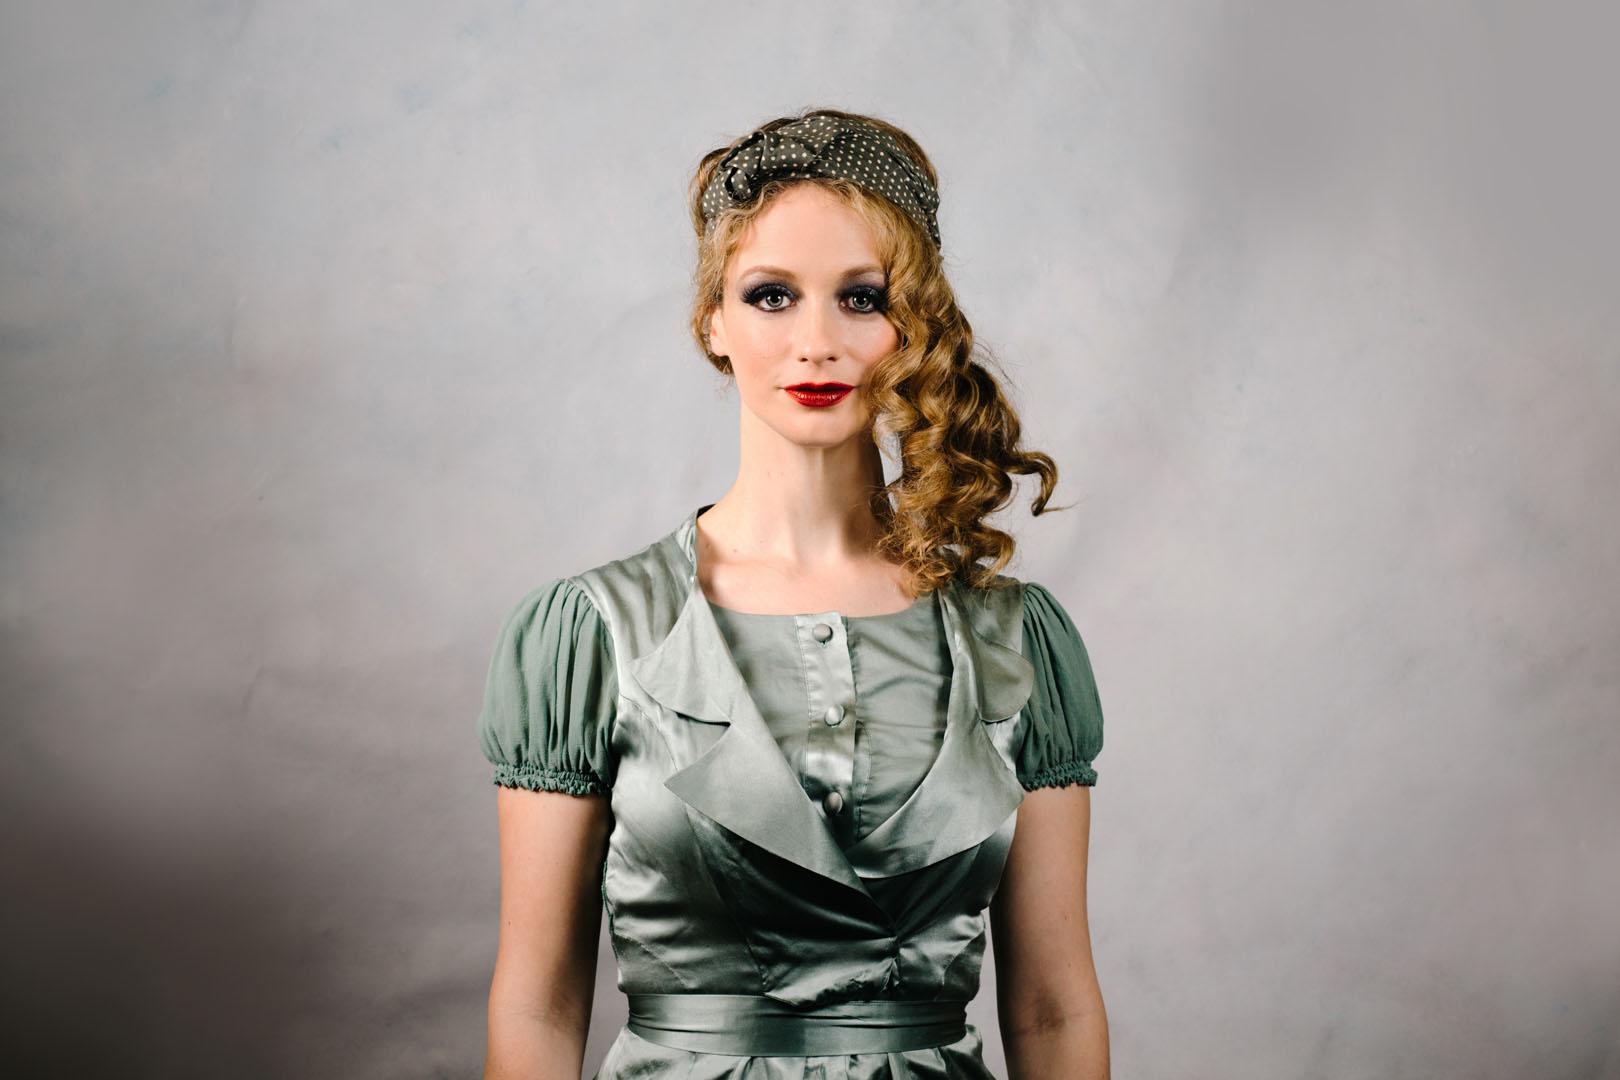 vintage_style_headscarf_olive_green_polkadot_turban